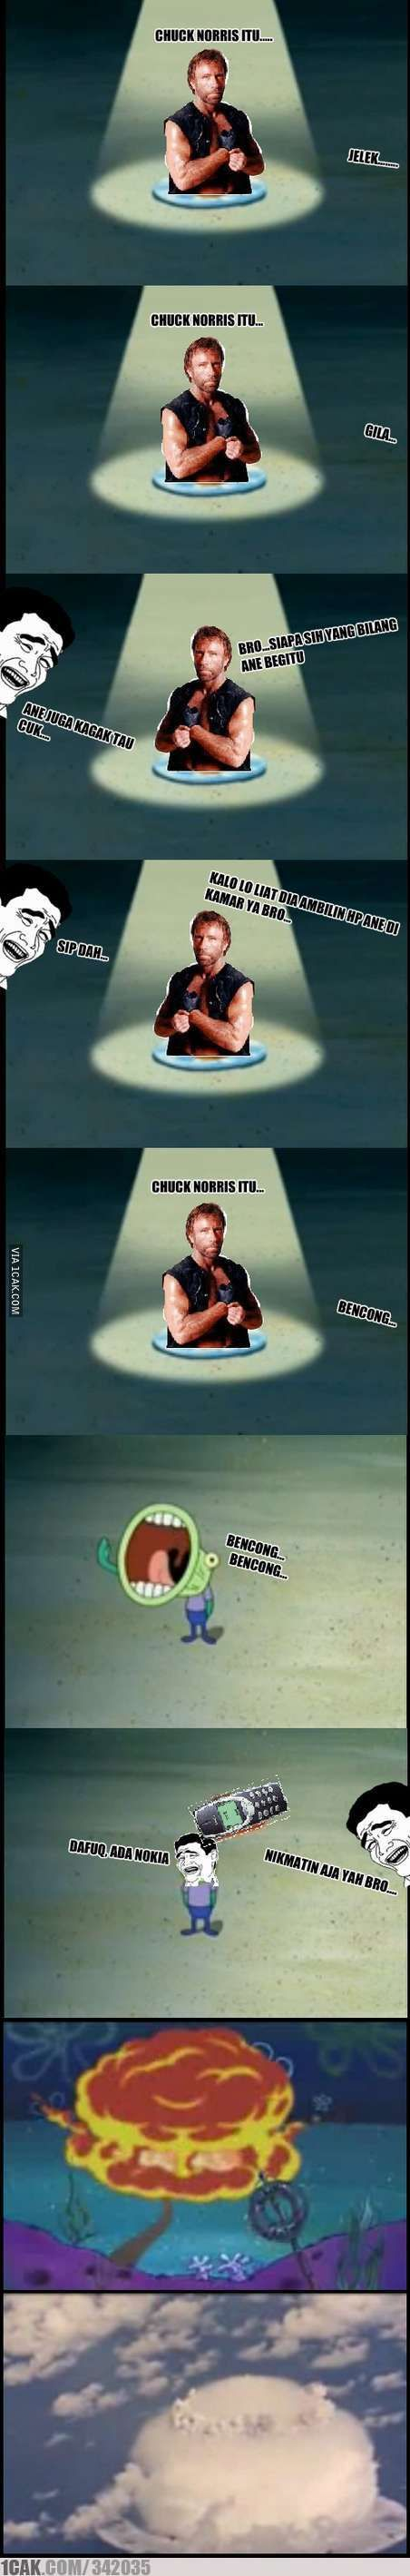 Chuck Norris Hoopla! #1cakerzz